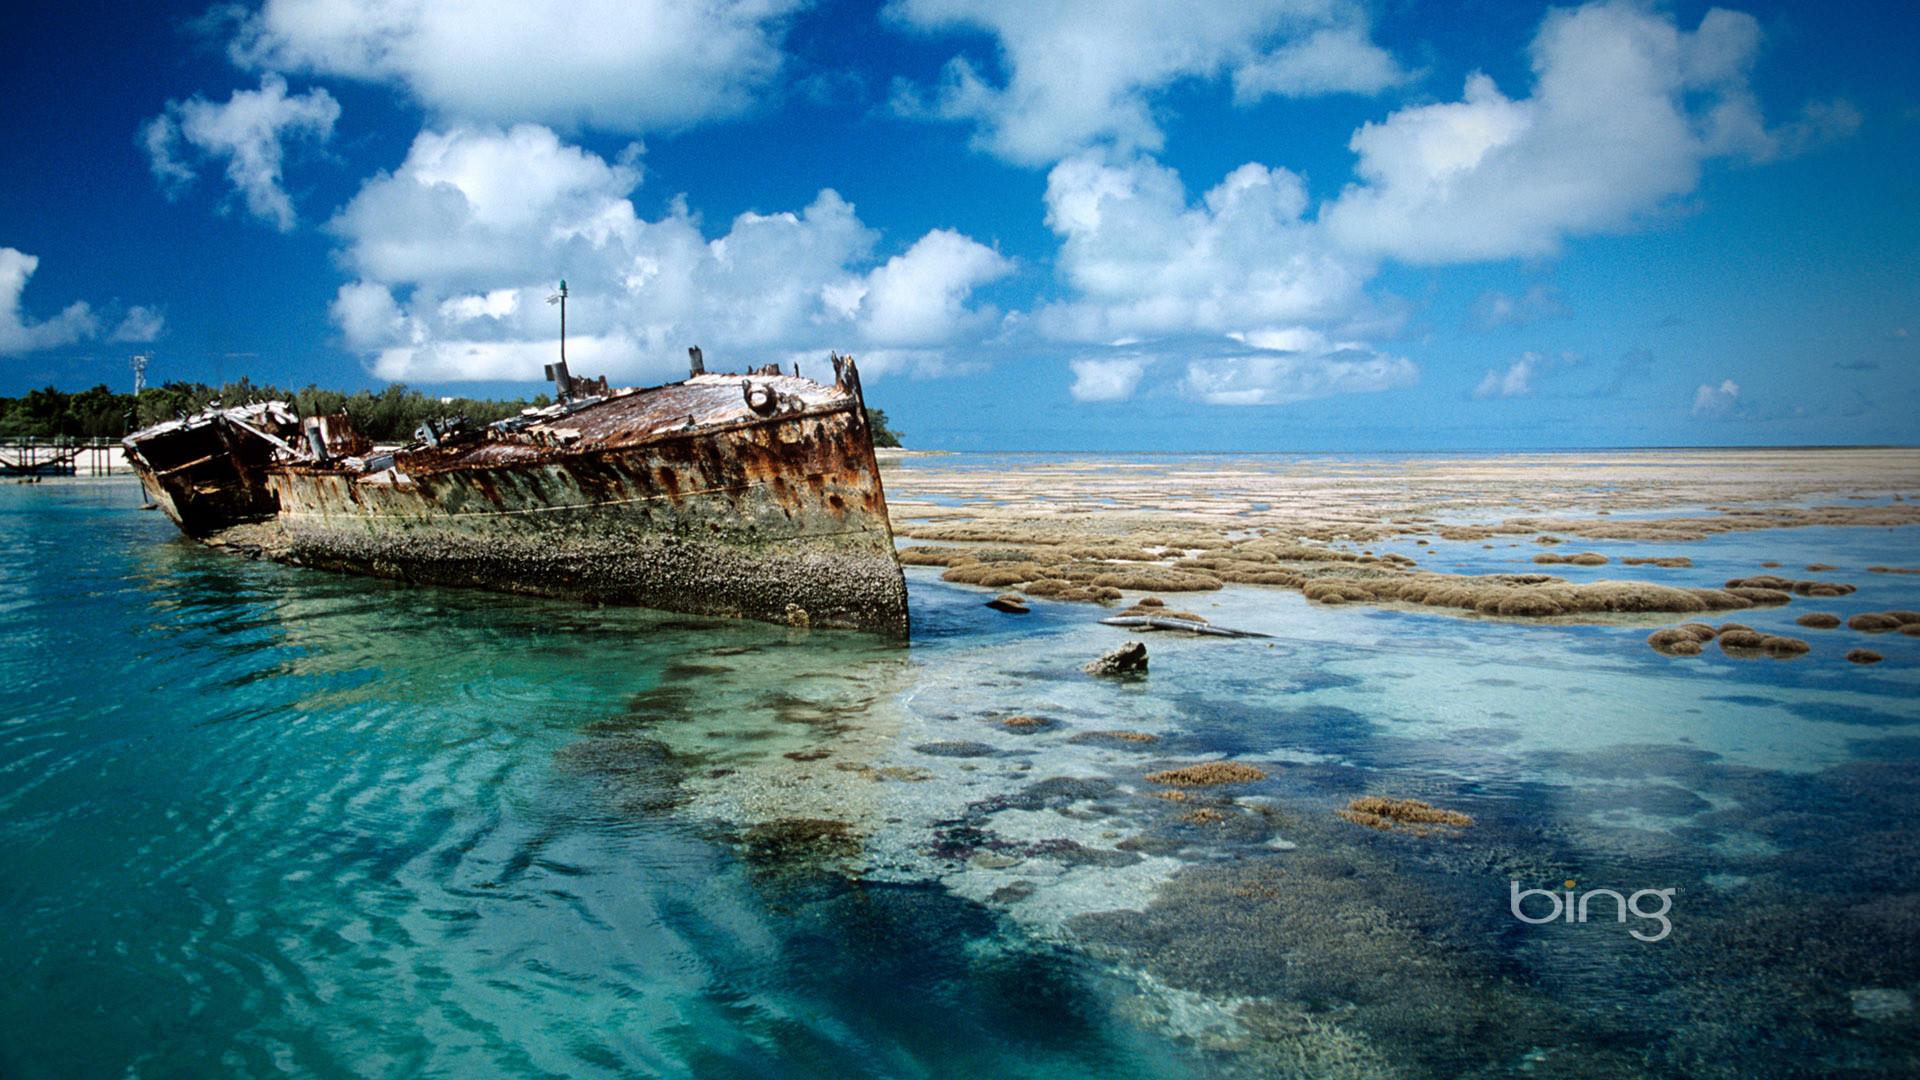 Image detail for -Bing Shipwreck on Heron Island, desktop background,  Australia, Full